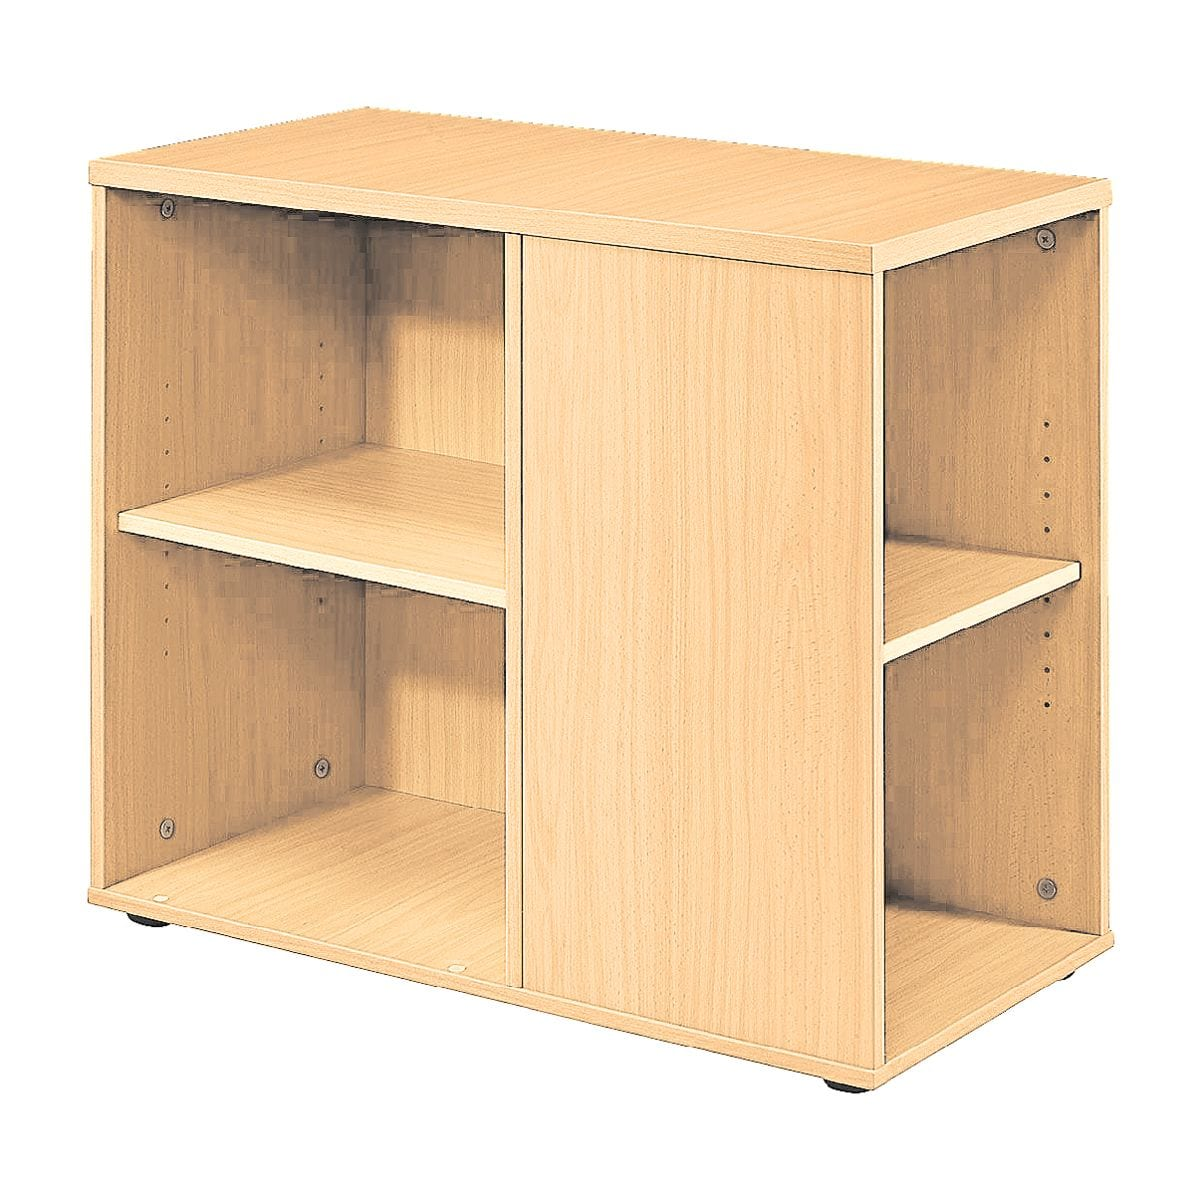 hammerbacher standcontainer flexiline ii 2 oh bei otto office g nstig kaufen. Black Bedroom Furniture Sets. Home Design Ideas